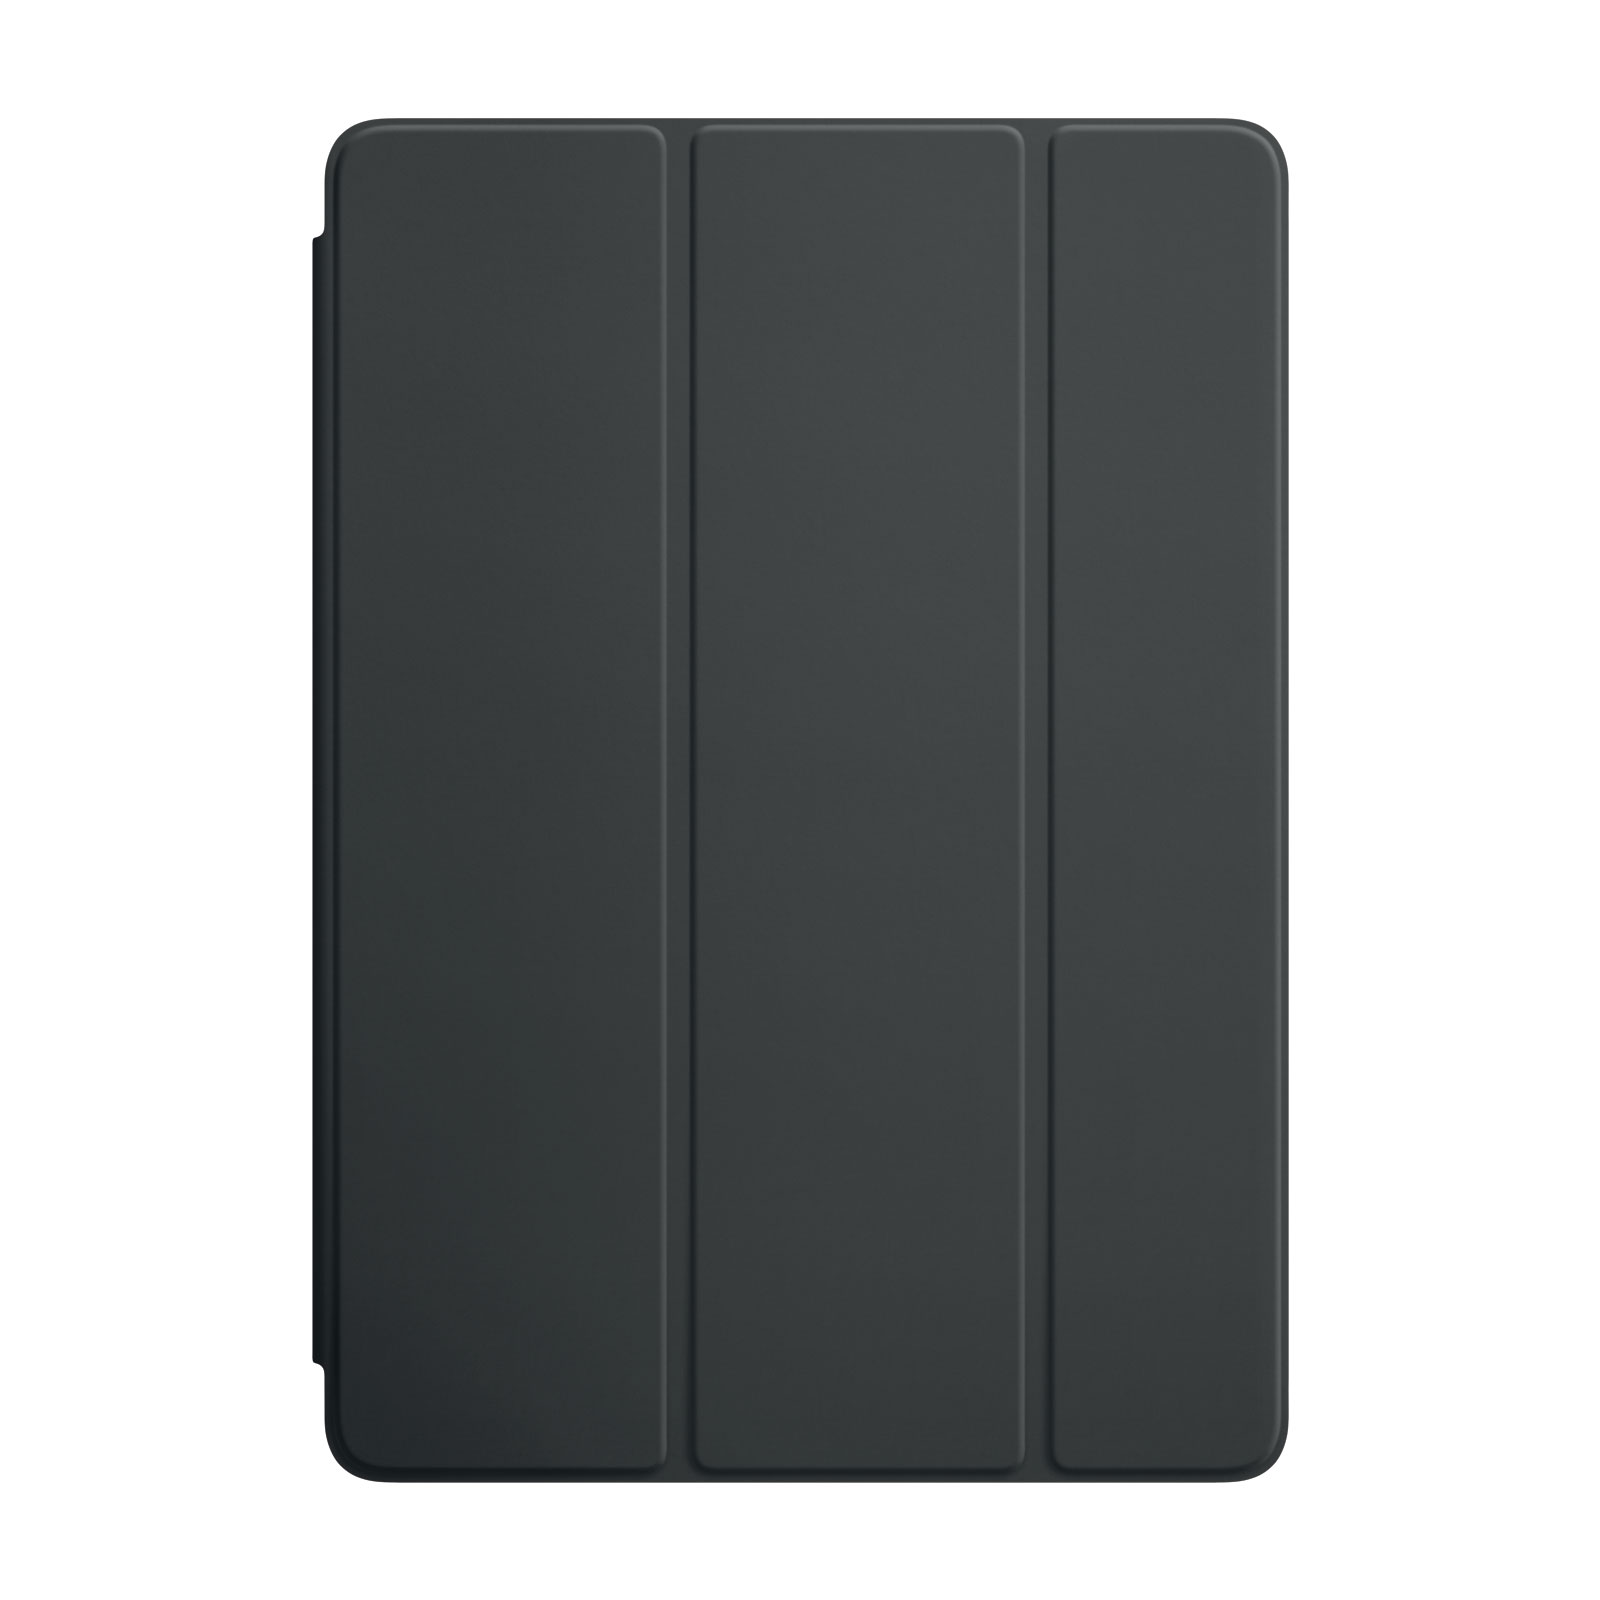 apple ipad smart cover gris anthracite accessoires tablette apple sur ldlc. Black Bedroom Furniture Sets. Home Design Ideas